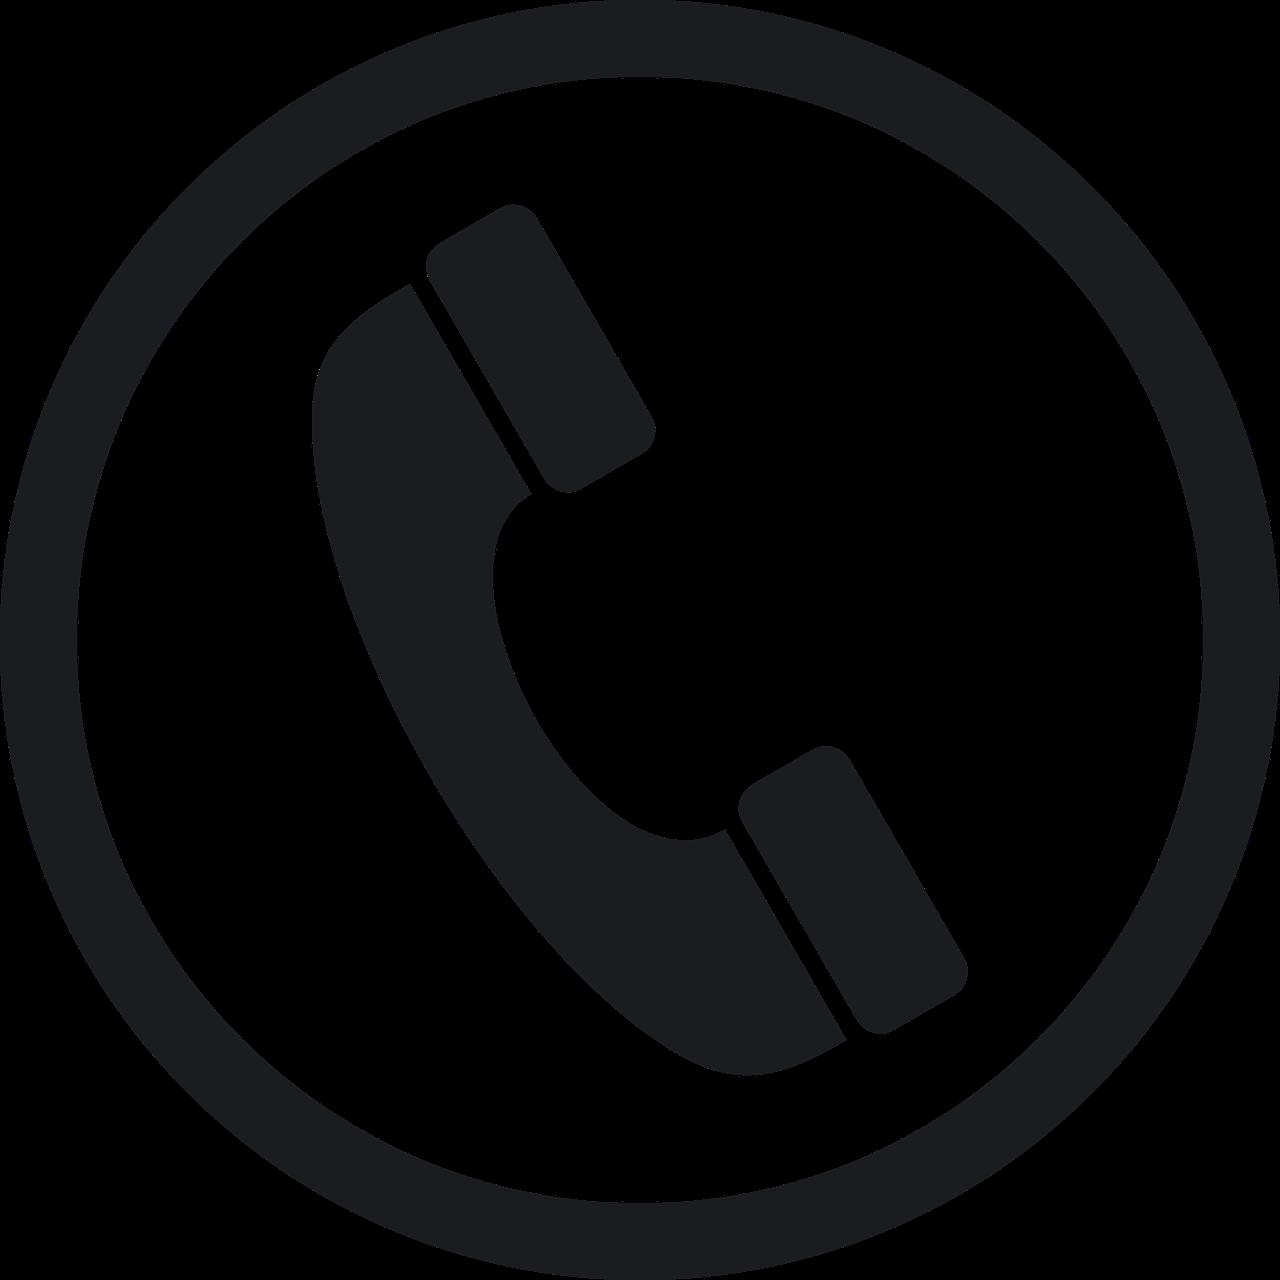 phone-31172_1280